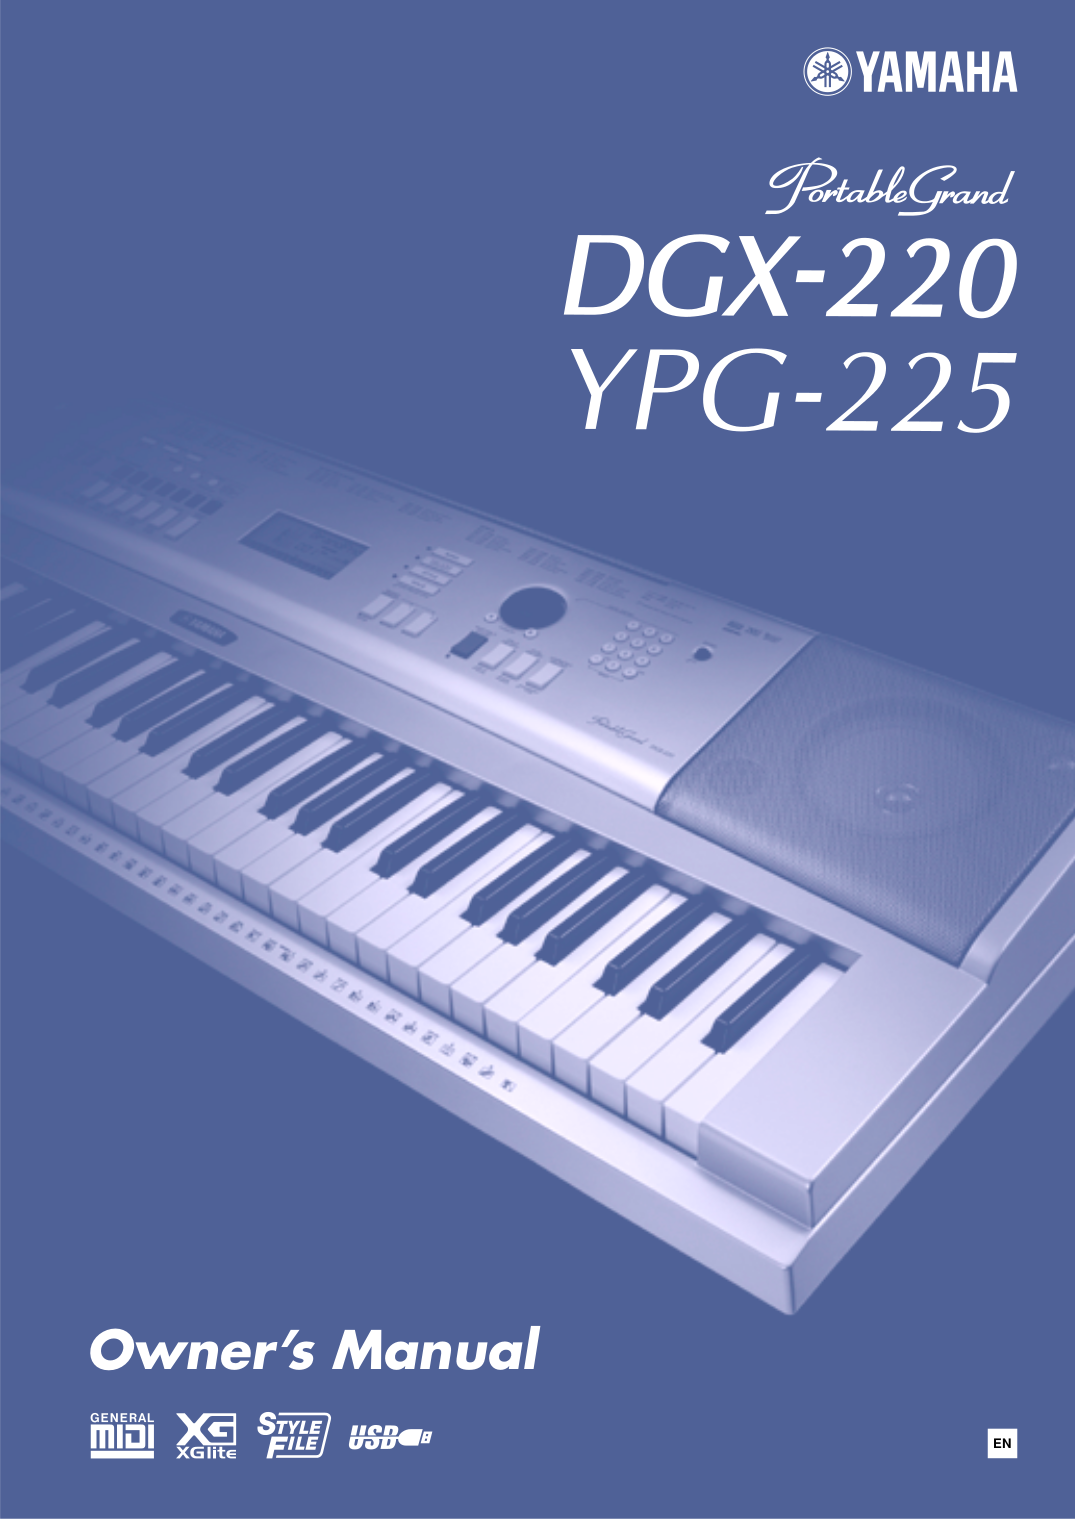 Yamaha dgx-230 ypg-235 keyboard service manual and repair guide.